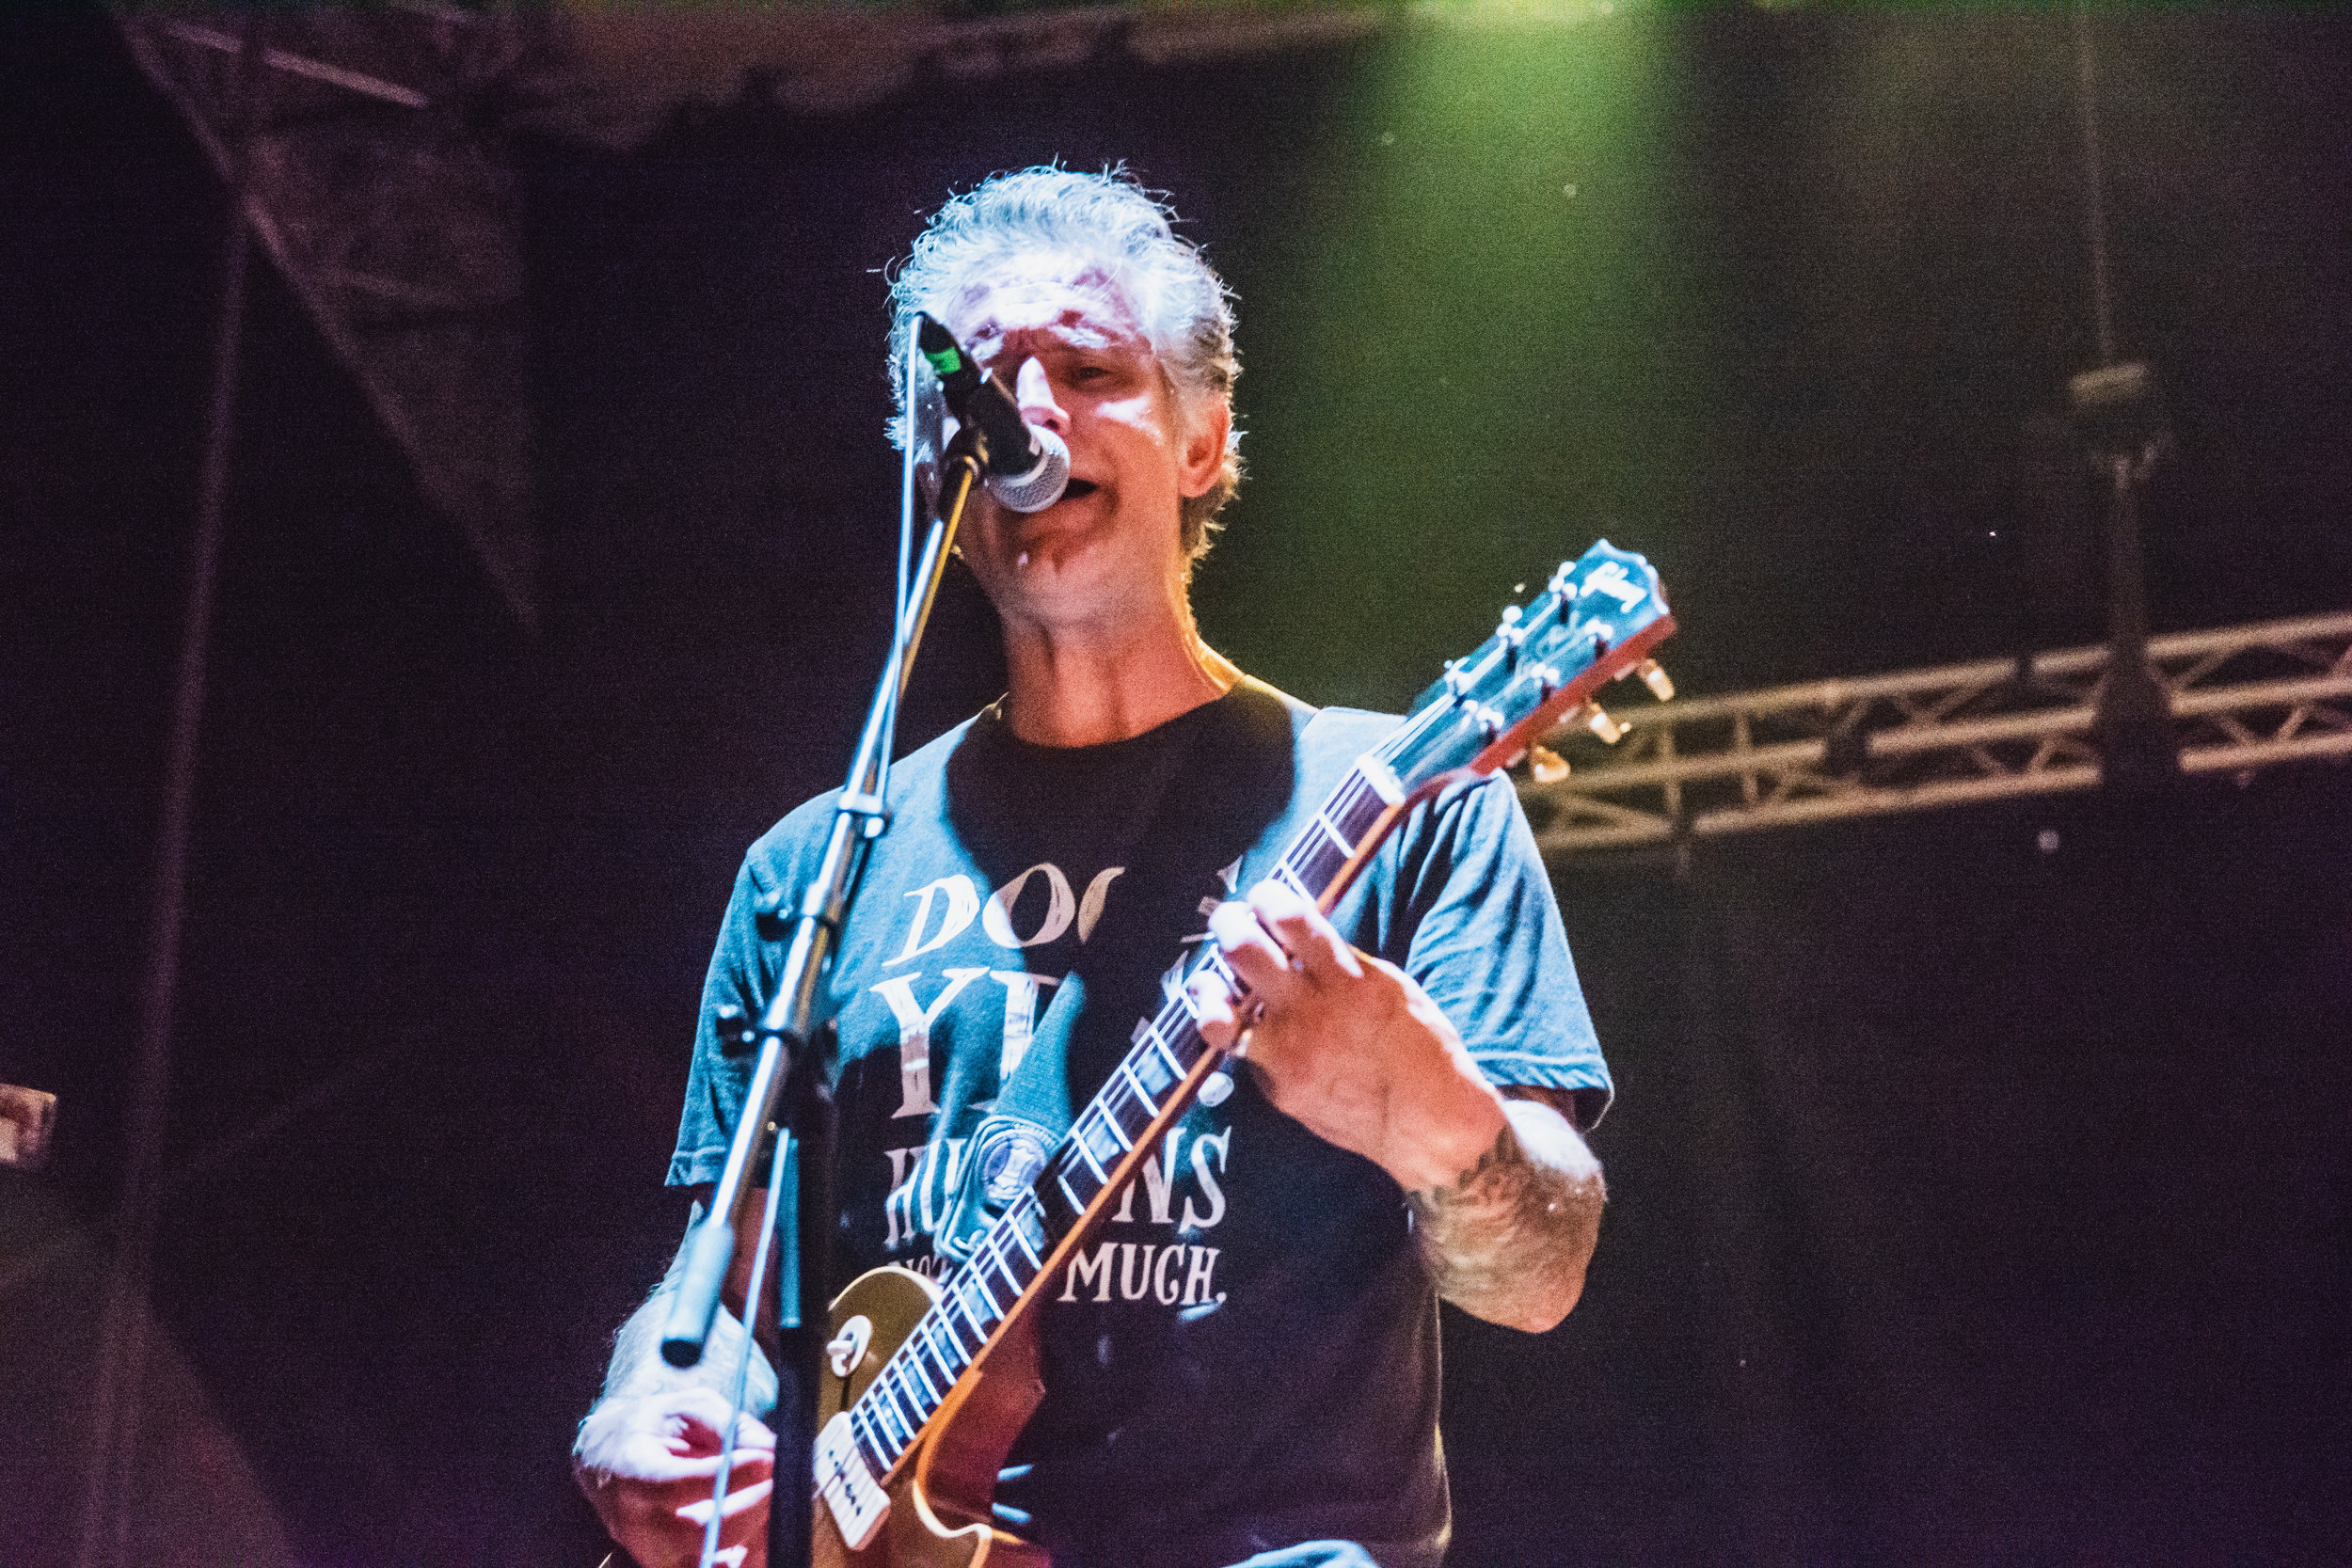 Punk-Rock-Holiday-Wednesday_58_2018August 08, 2018.jpg